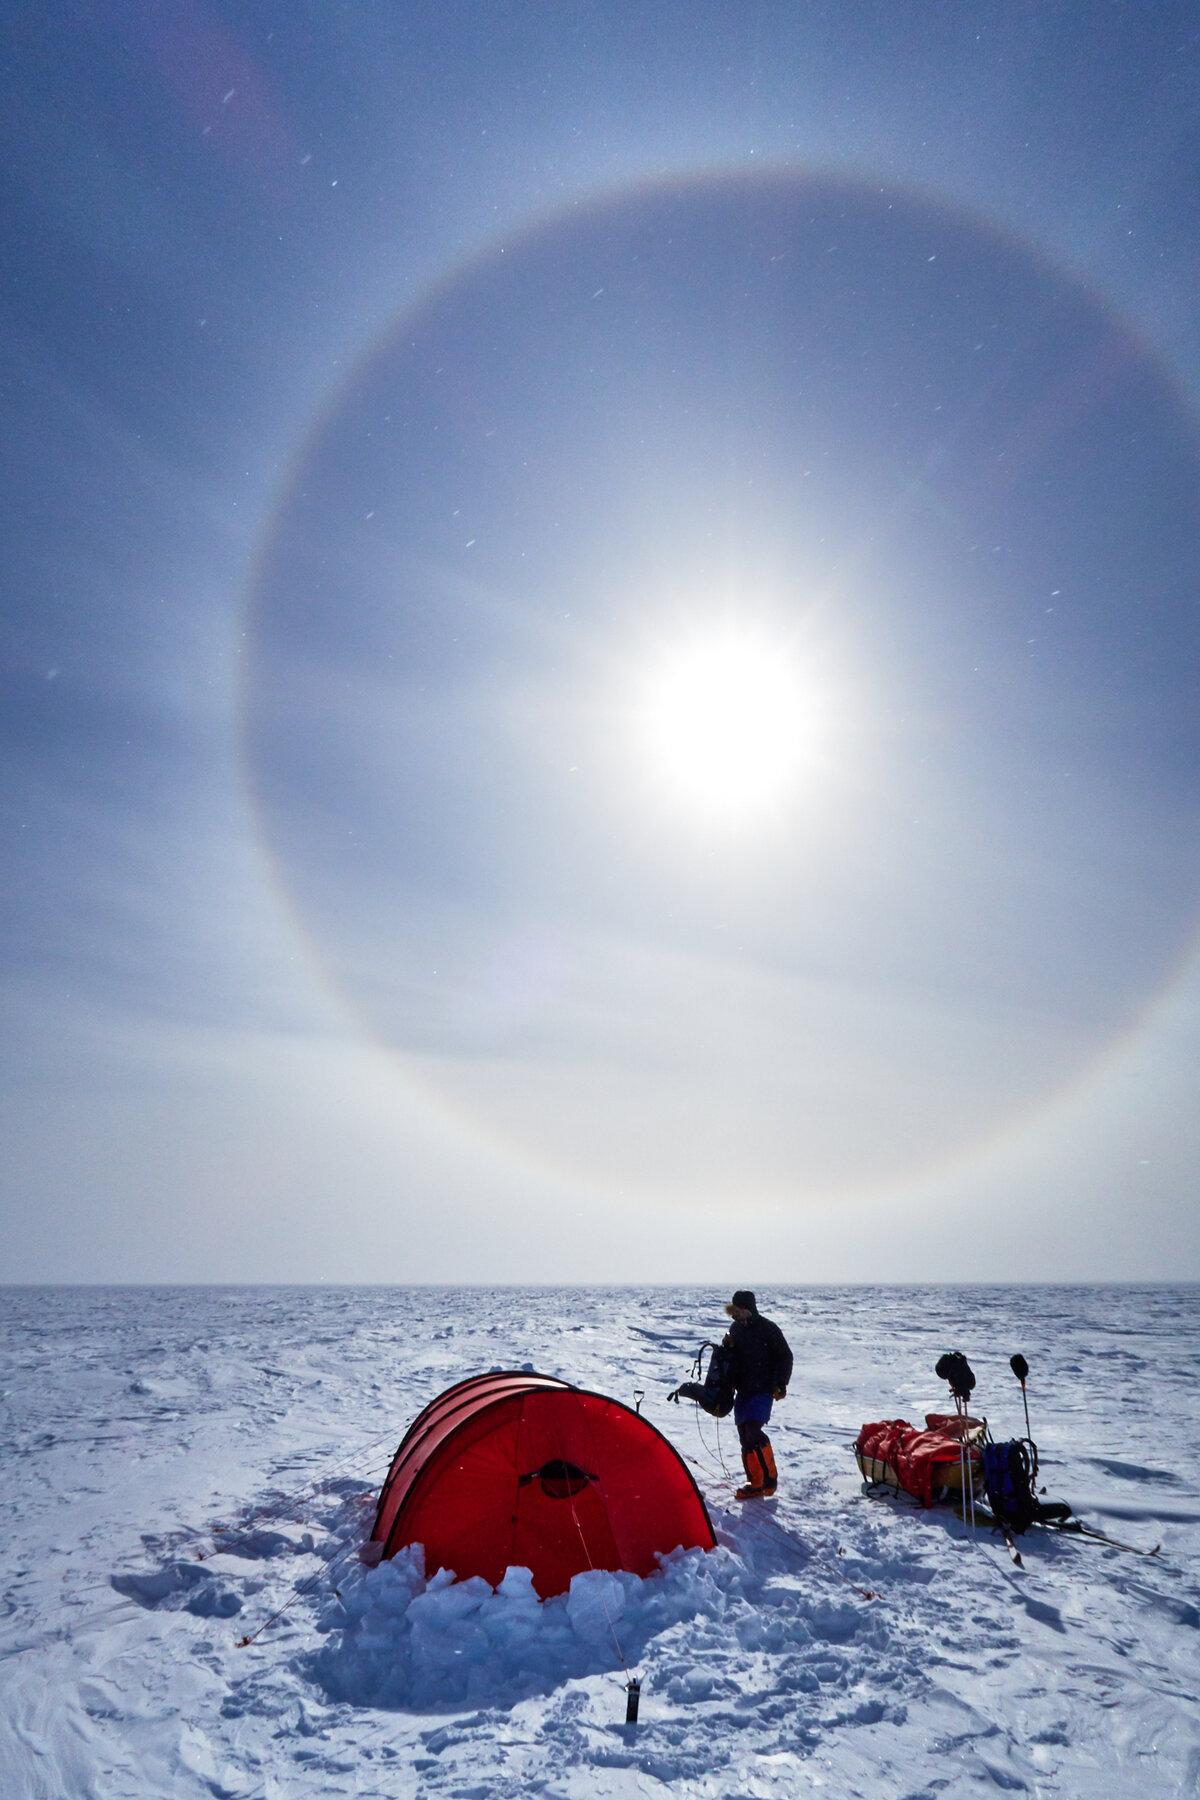 High cloud creates a halo around the sun